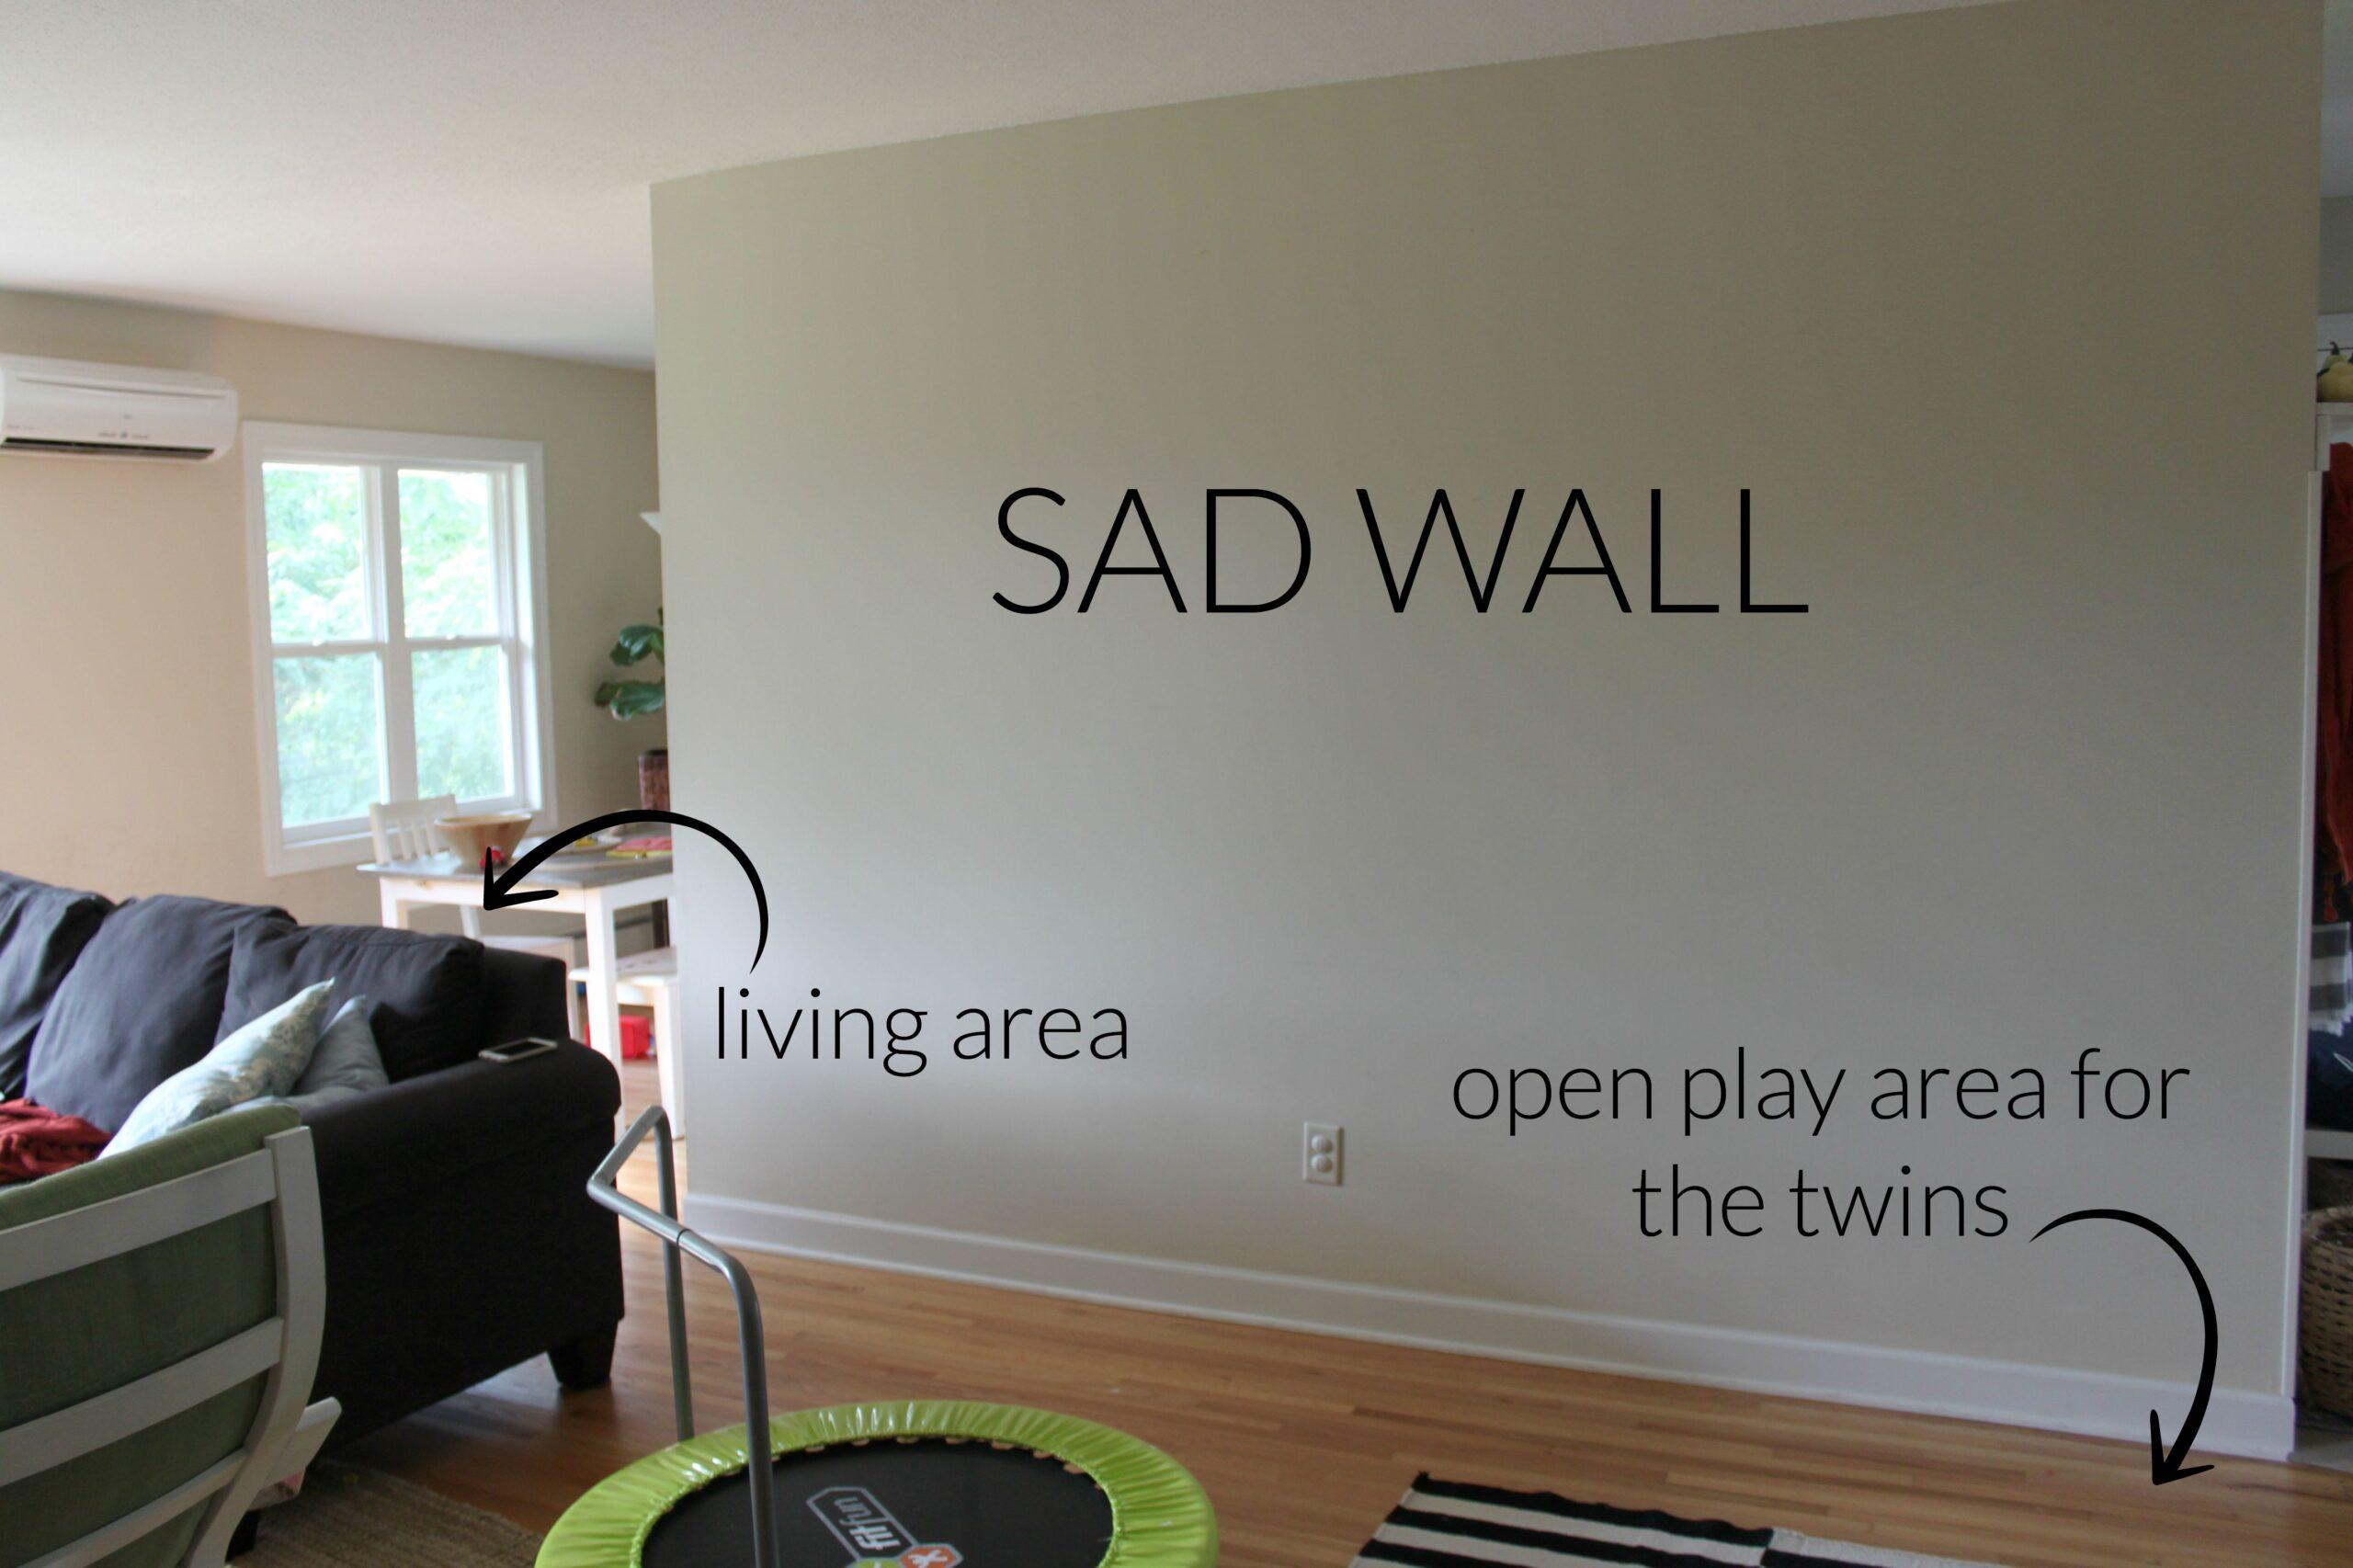 Big empty living room - Empty Frames As Wall Decor Big Picture Frame For Living Room Frames